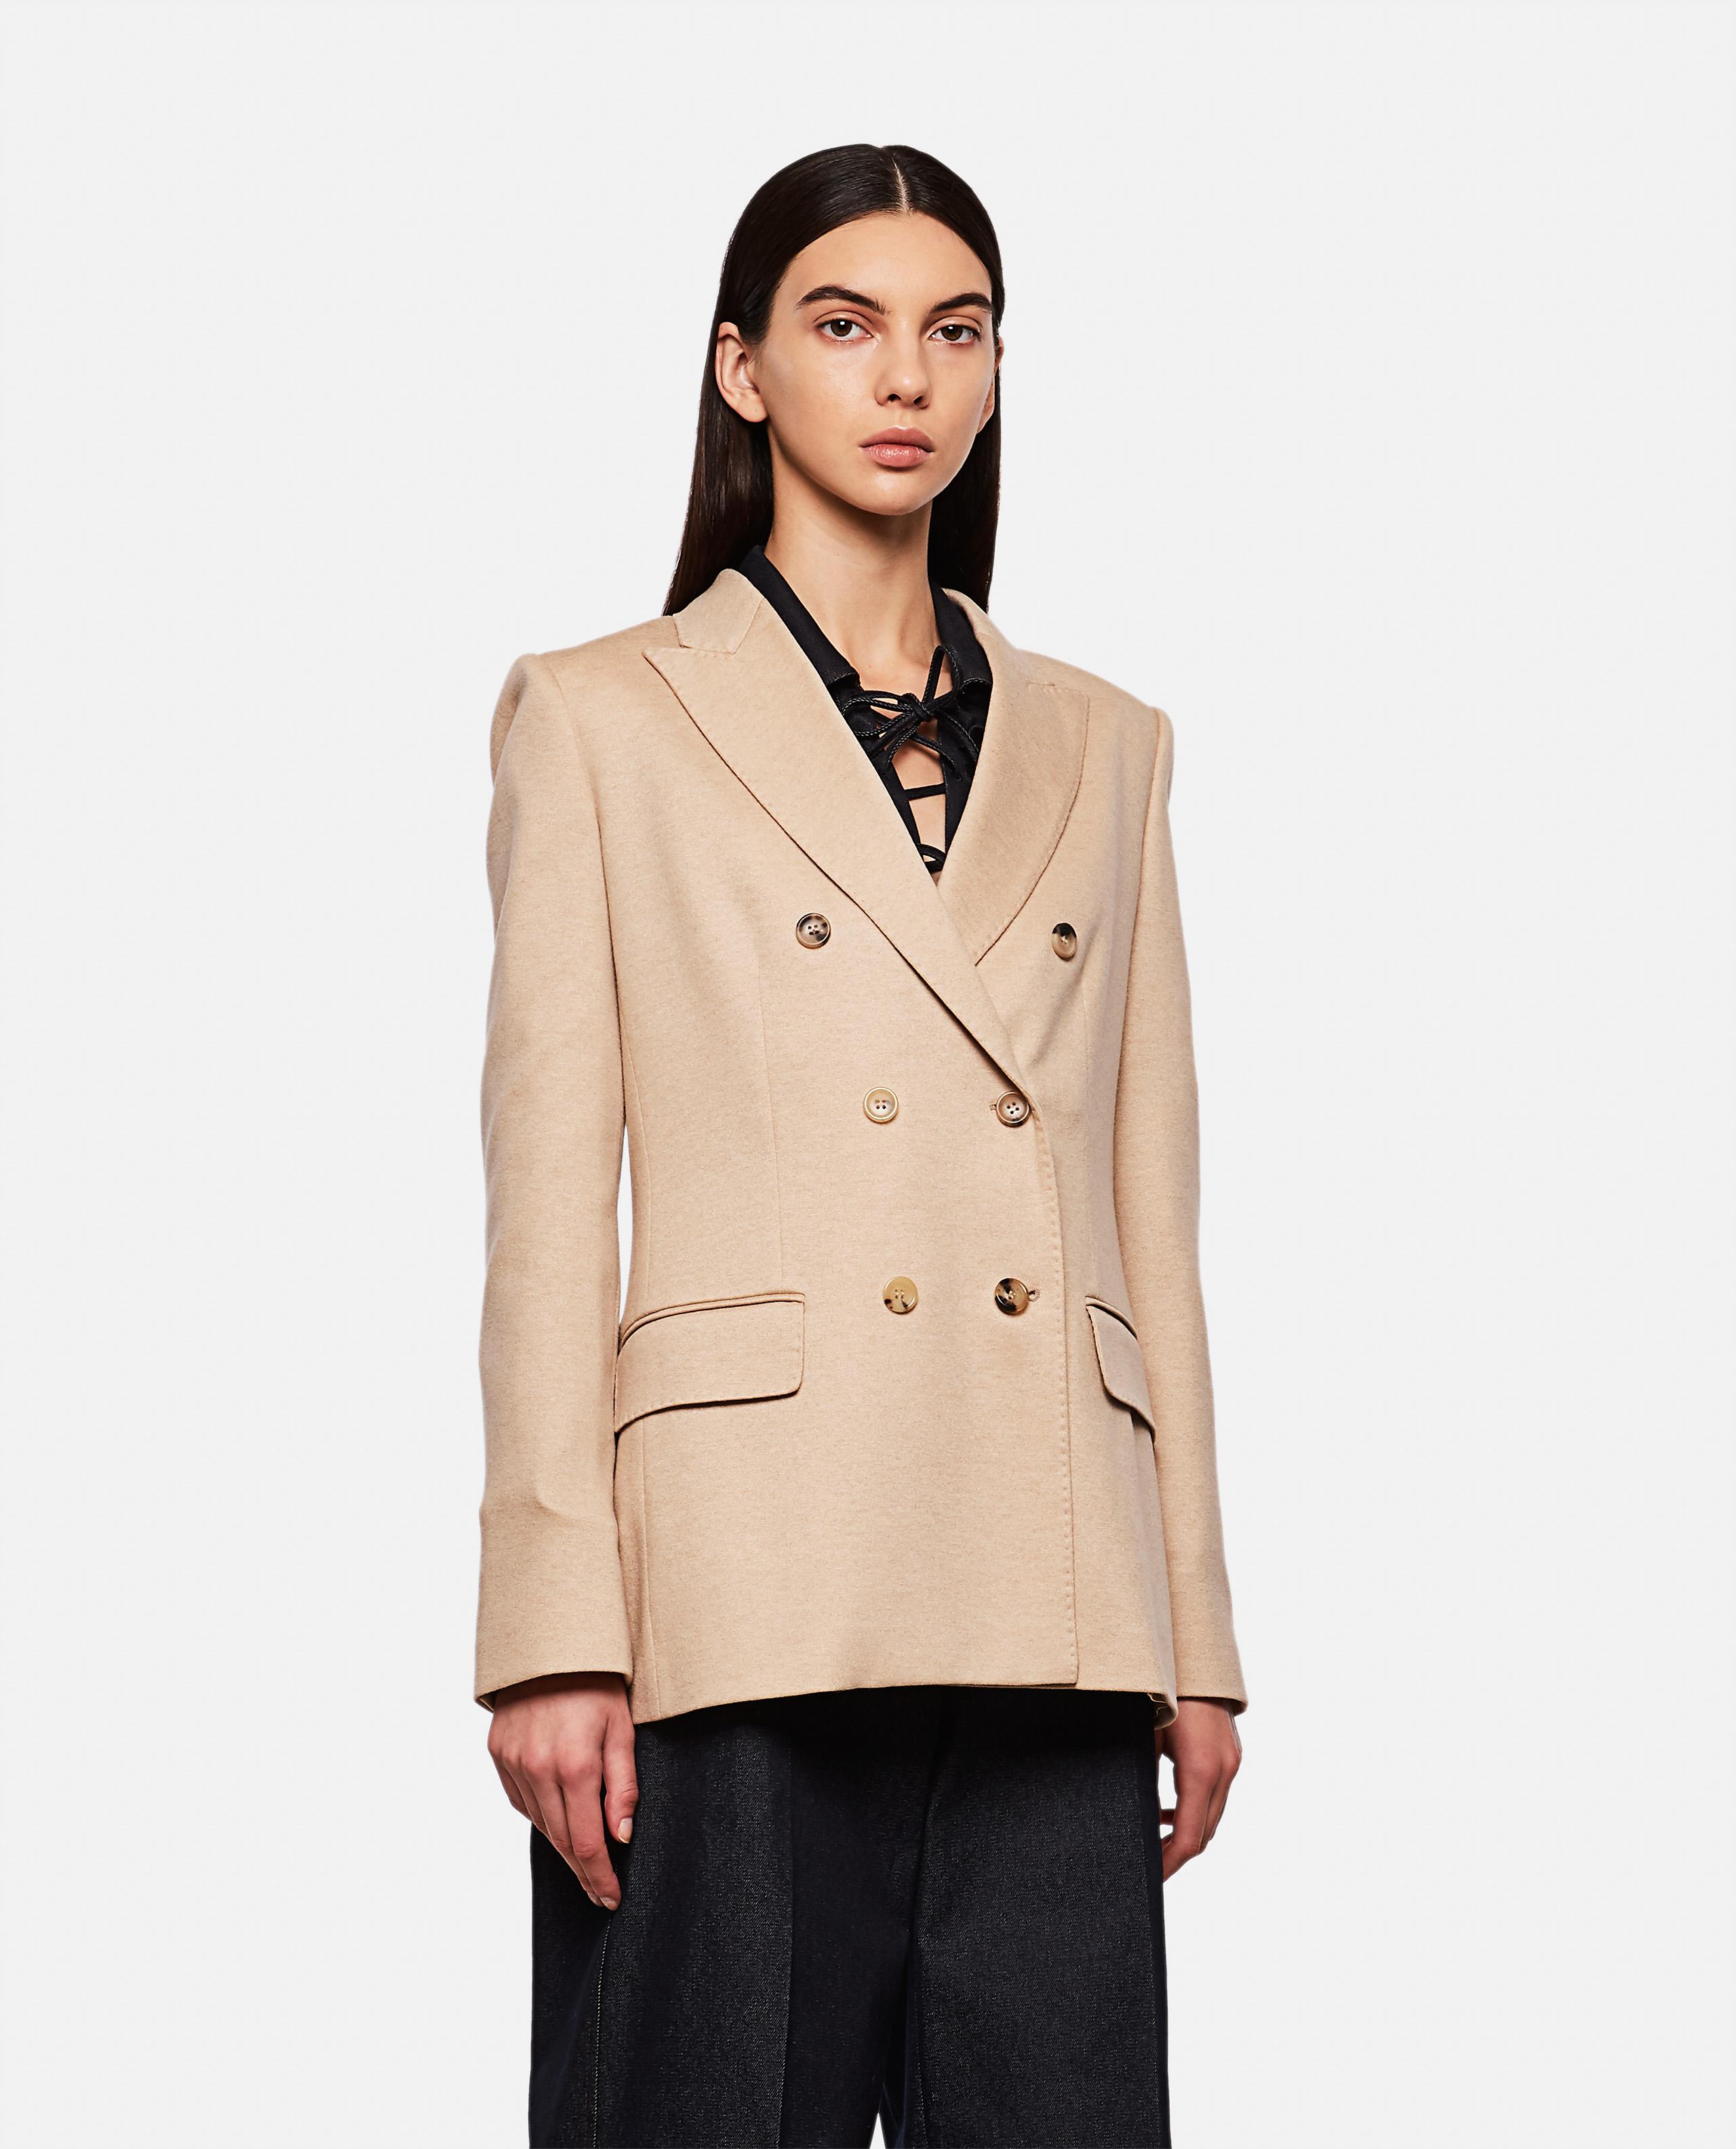 Camel-colored wool blazer